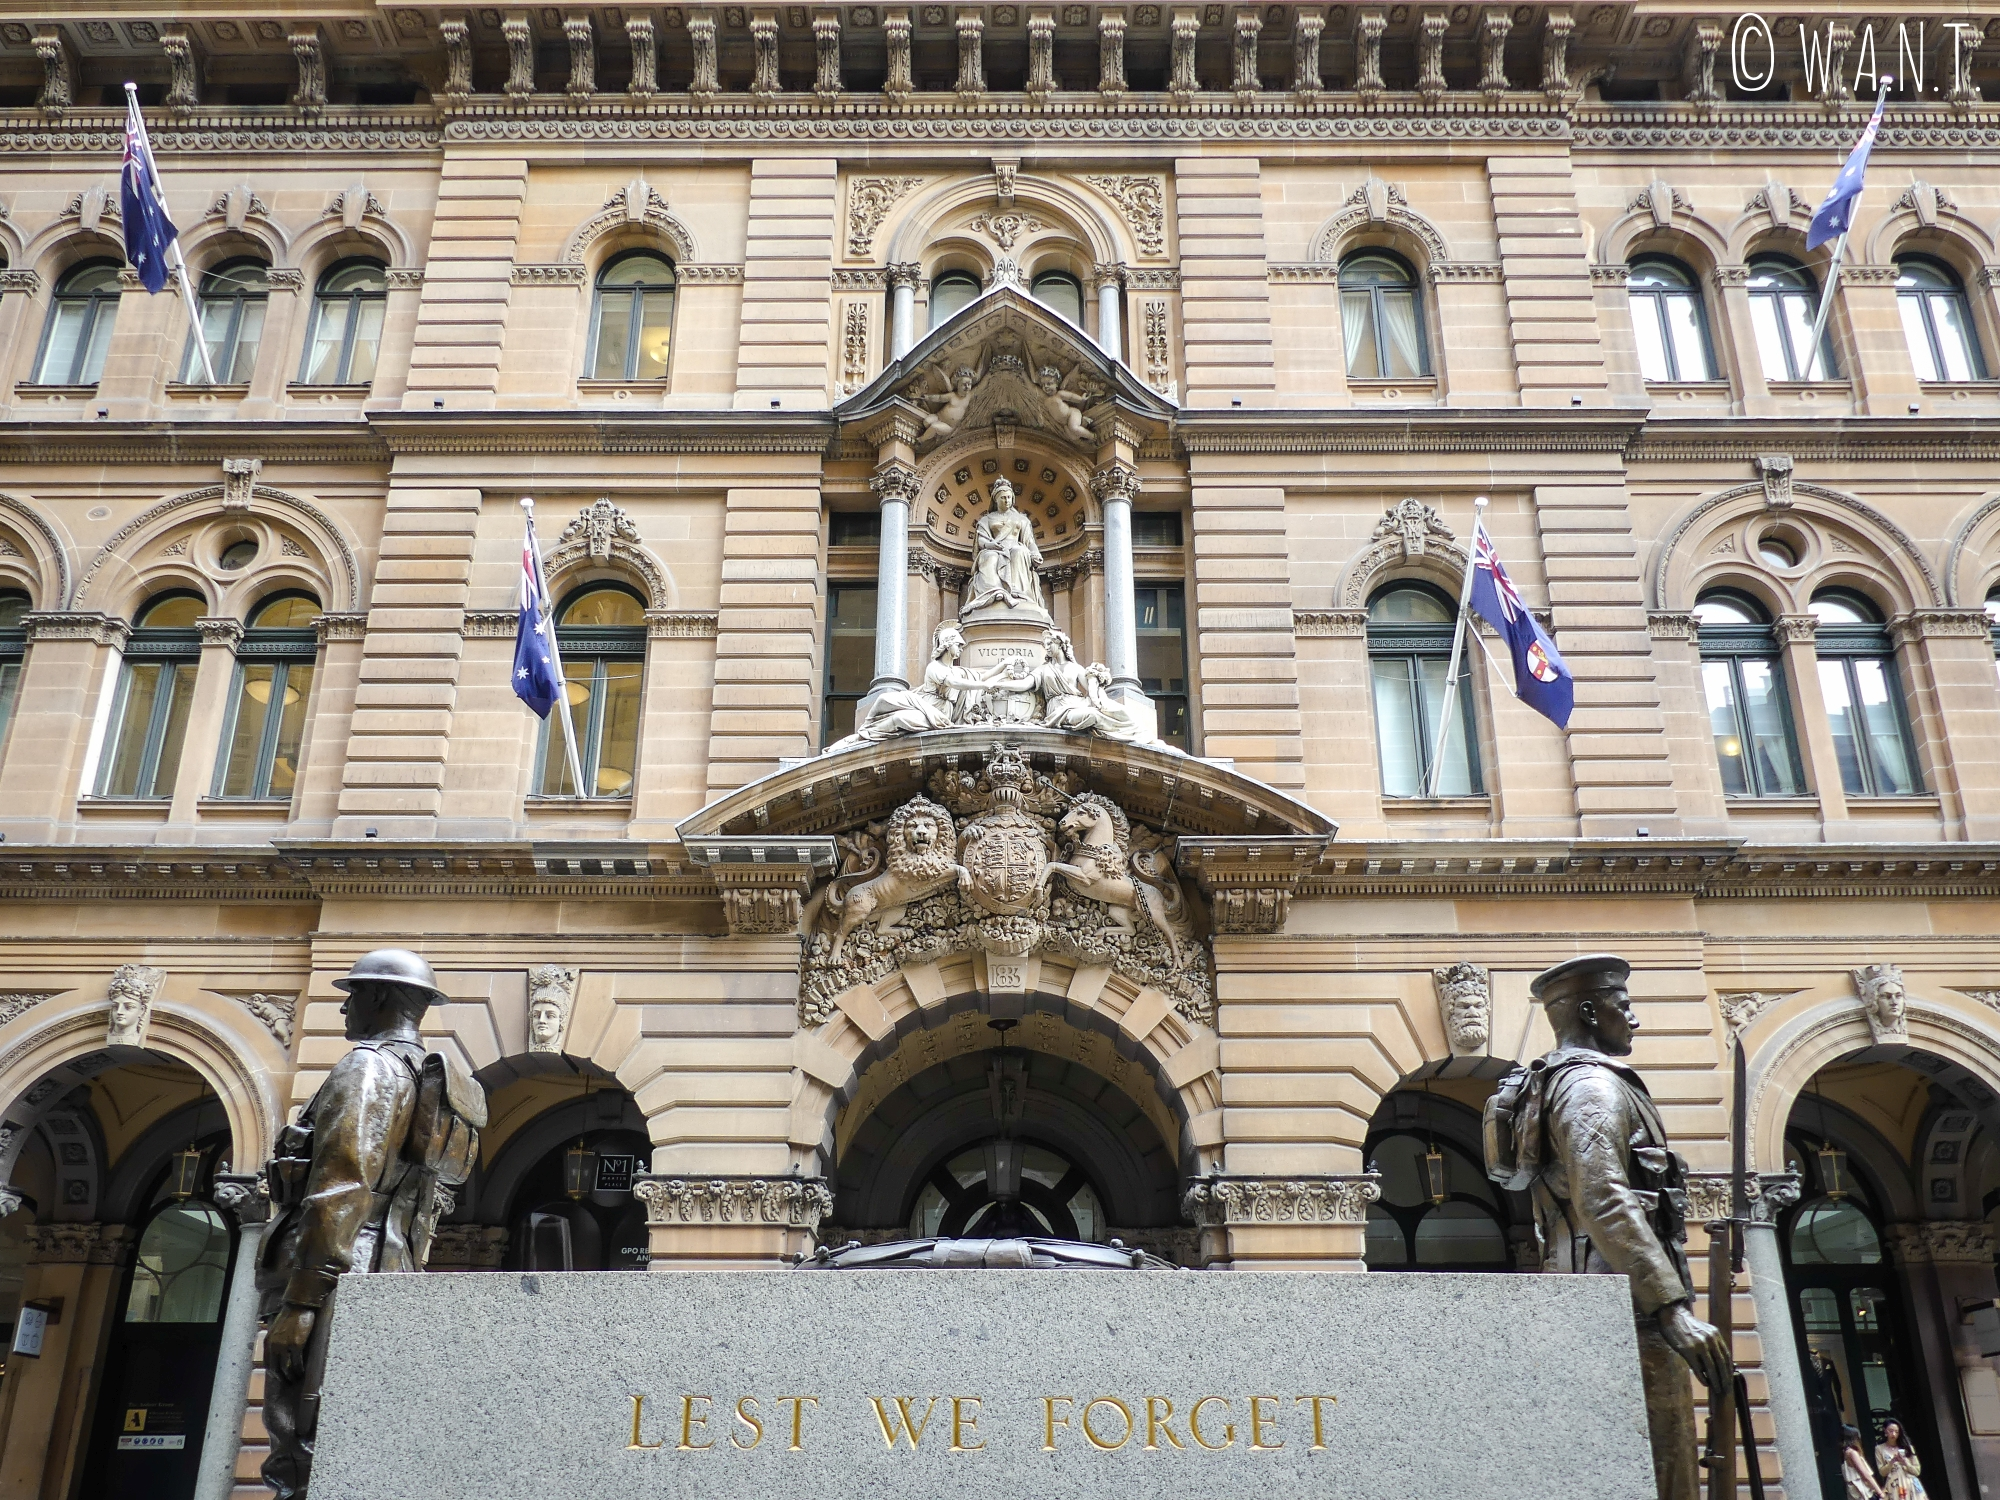 Façade de l'hôtel Westin de Sydney